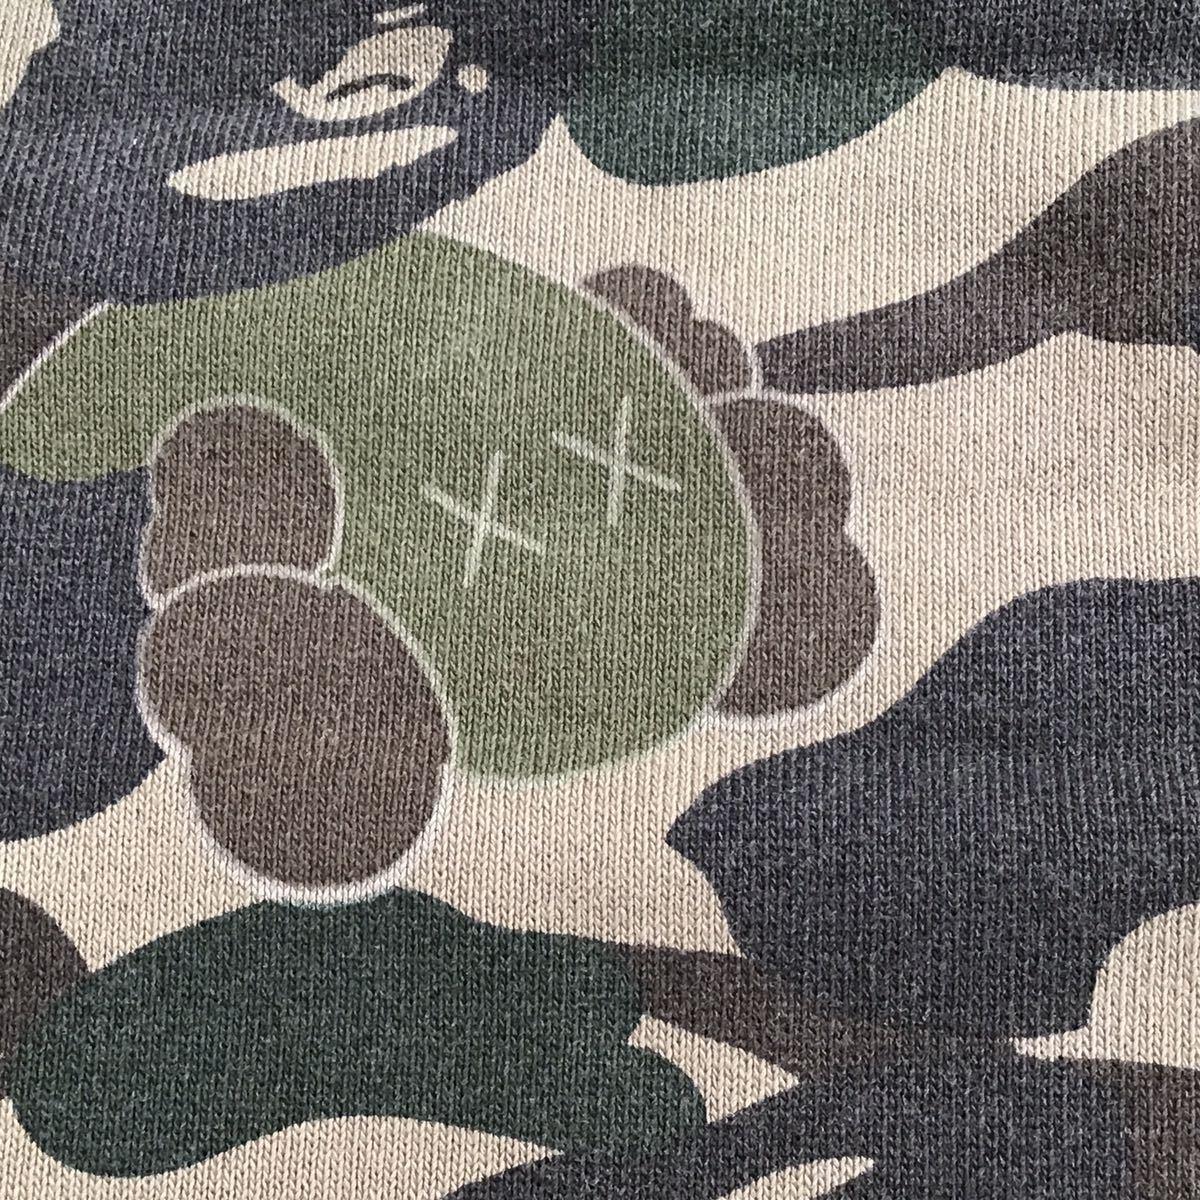 kaws × bape 半袖 スウェット Sサイズ bendy 1st camo green a bathing ape sweat エイプ ベイプ アベイシングエイプ 迷彩 w5da